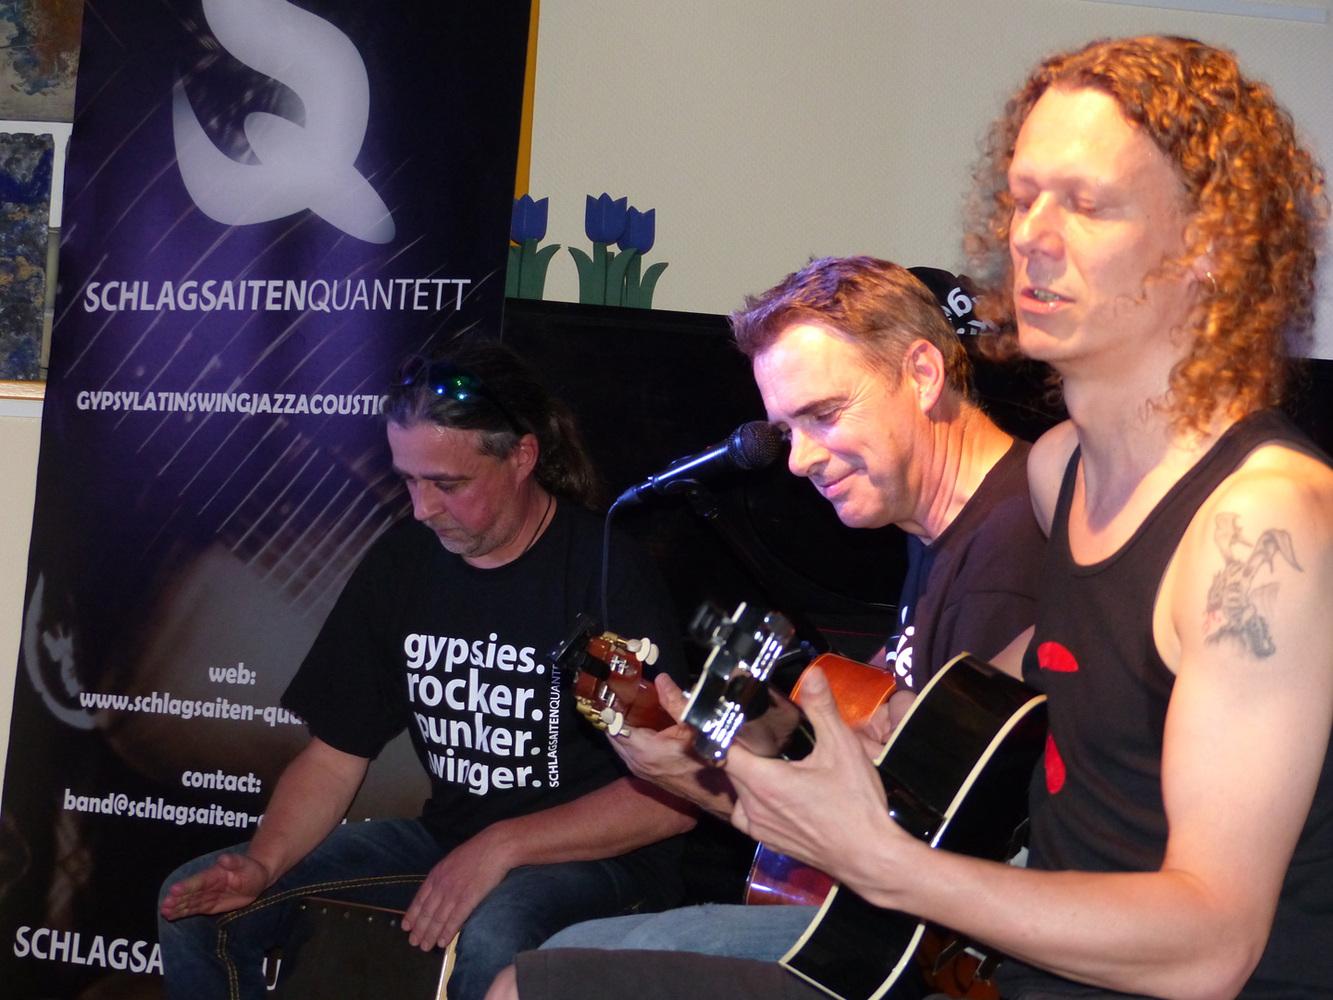 Konzert mit Schlagsaiten Quantett @ Kreatives Atelier Regenbogen VoG Hauset | Raeren | Région wallonne | Belgien